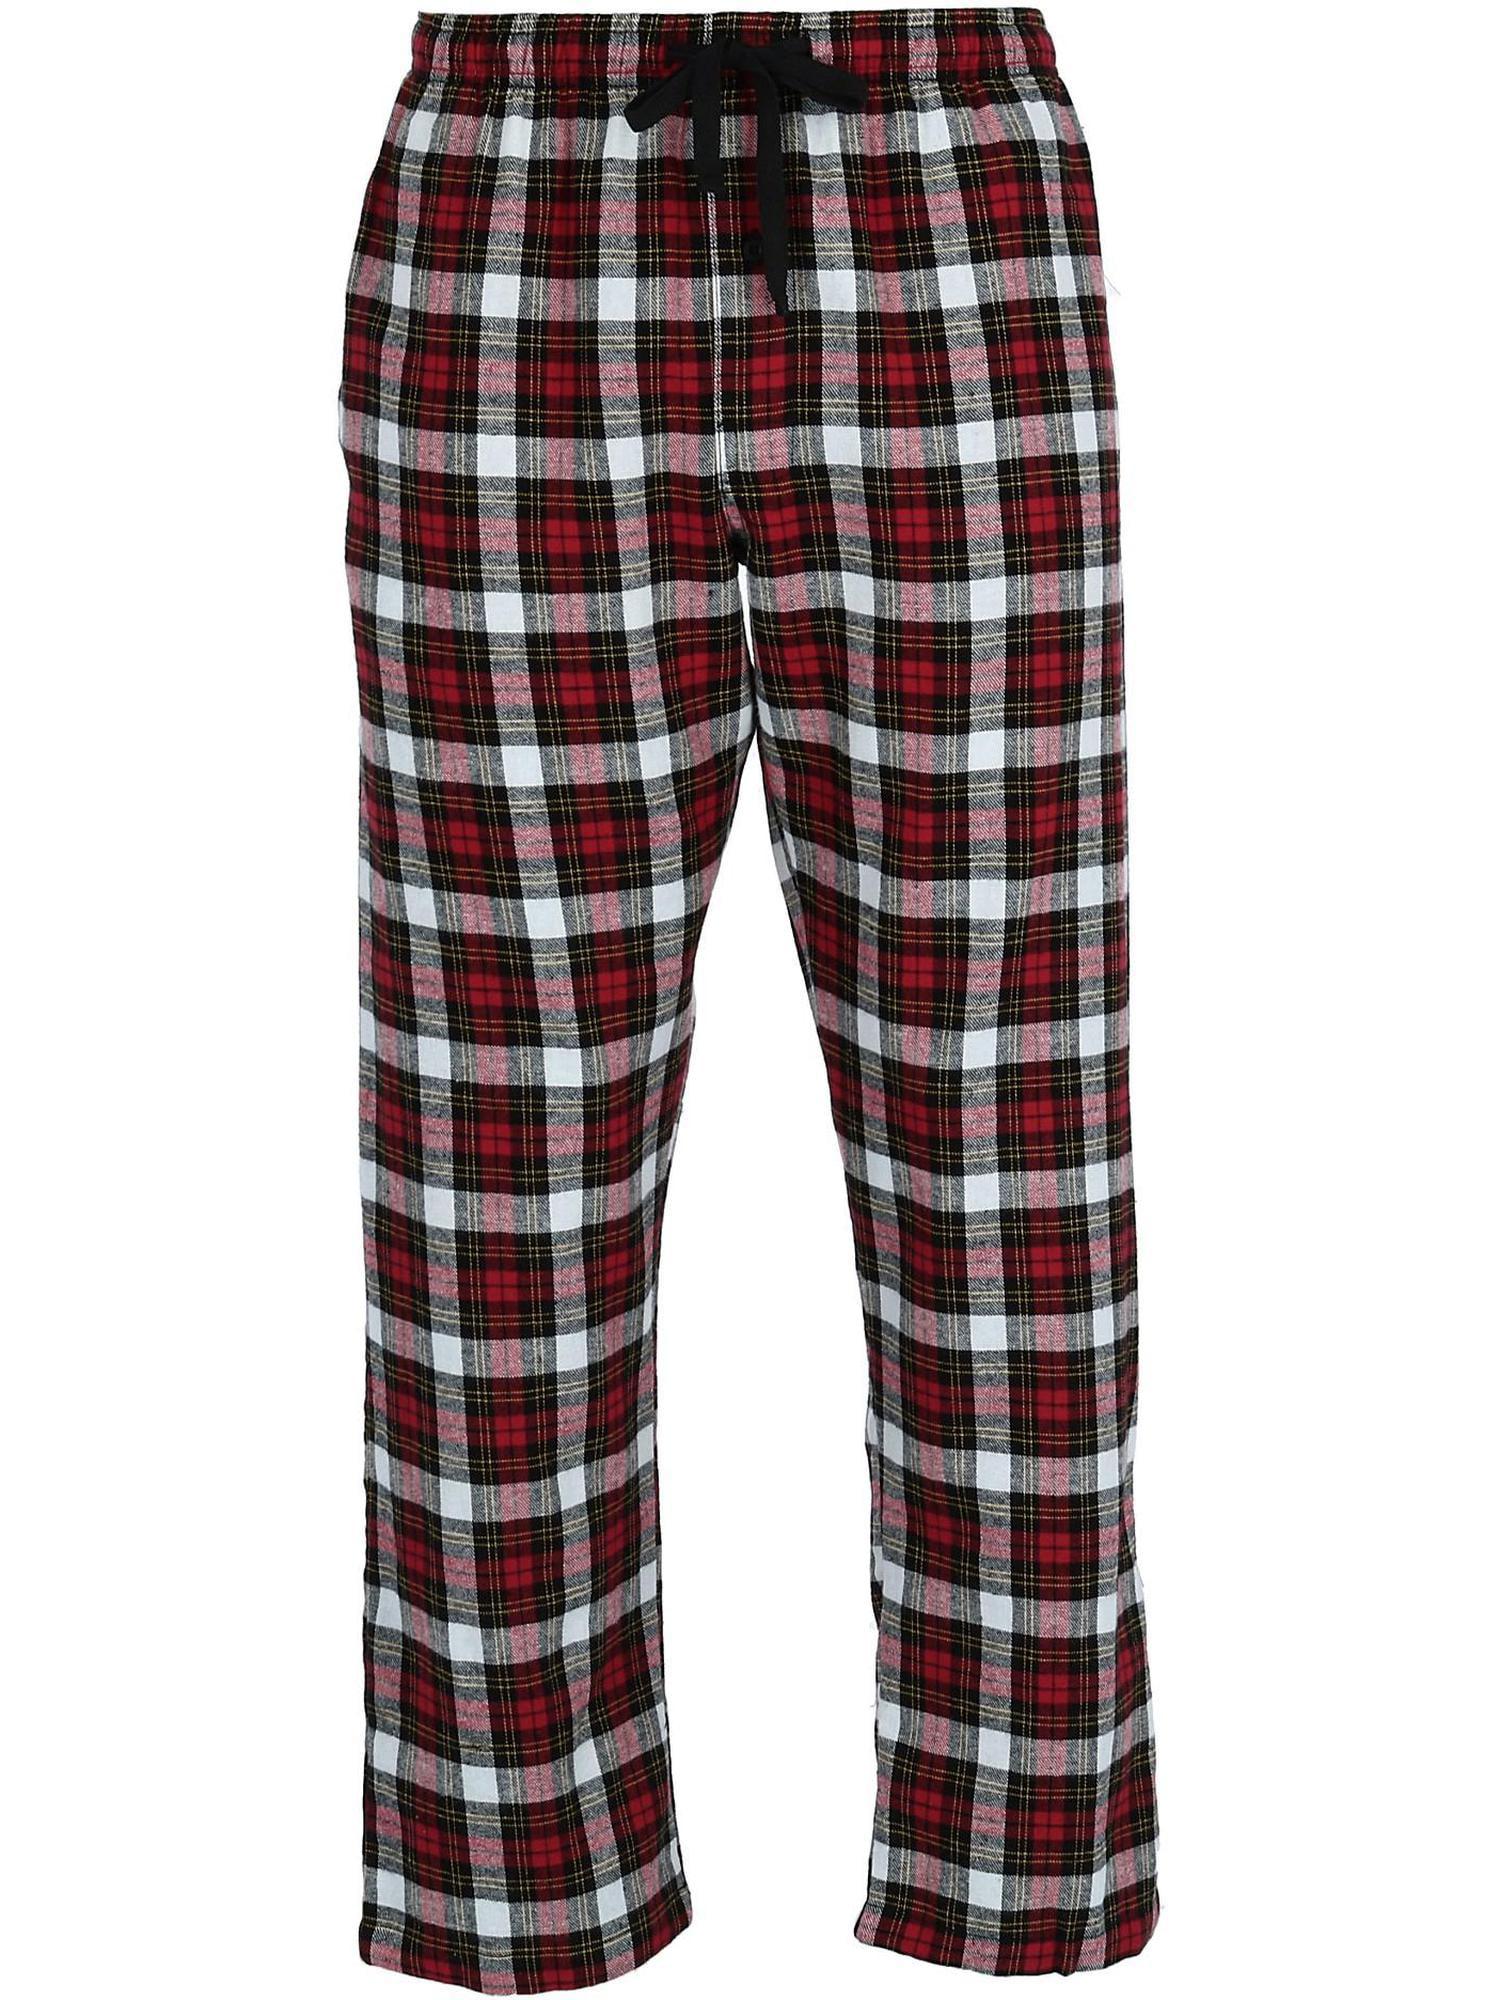 Joe Boxer 2 Piece Men/'s Fleece Pajamas Set Soft Shirt Warm Pants PJ Sleepwear Top /& Bottom